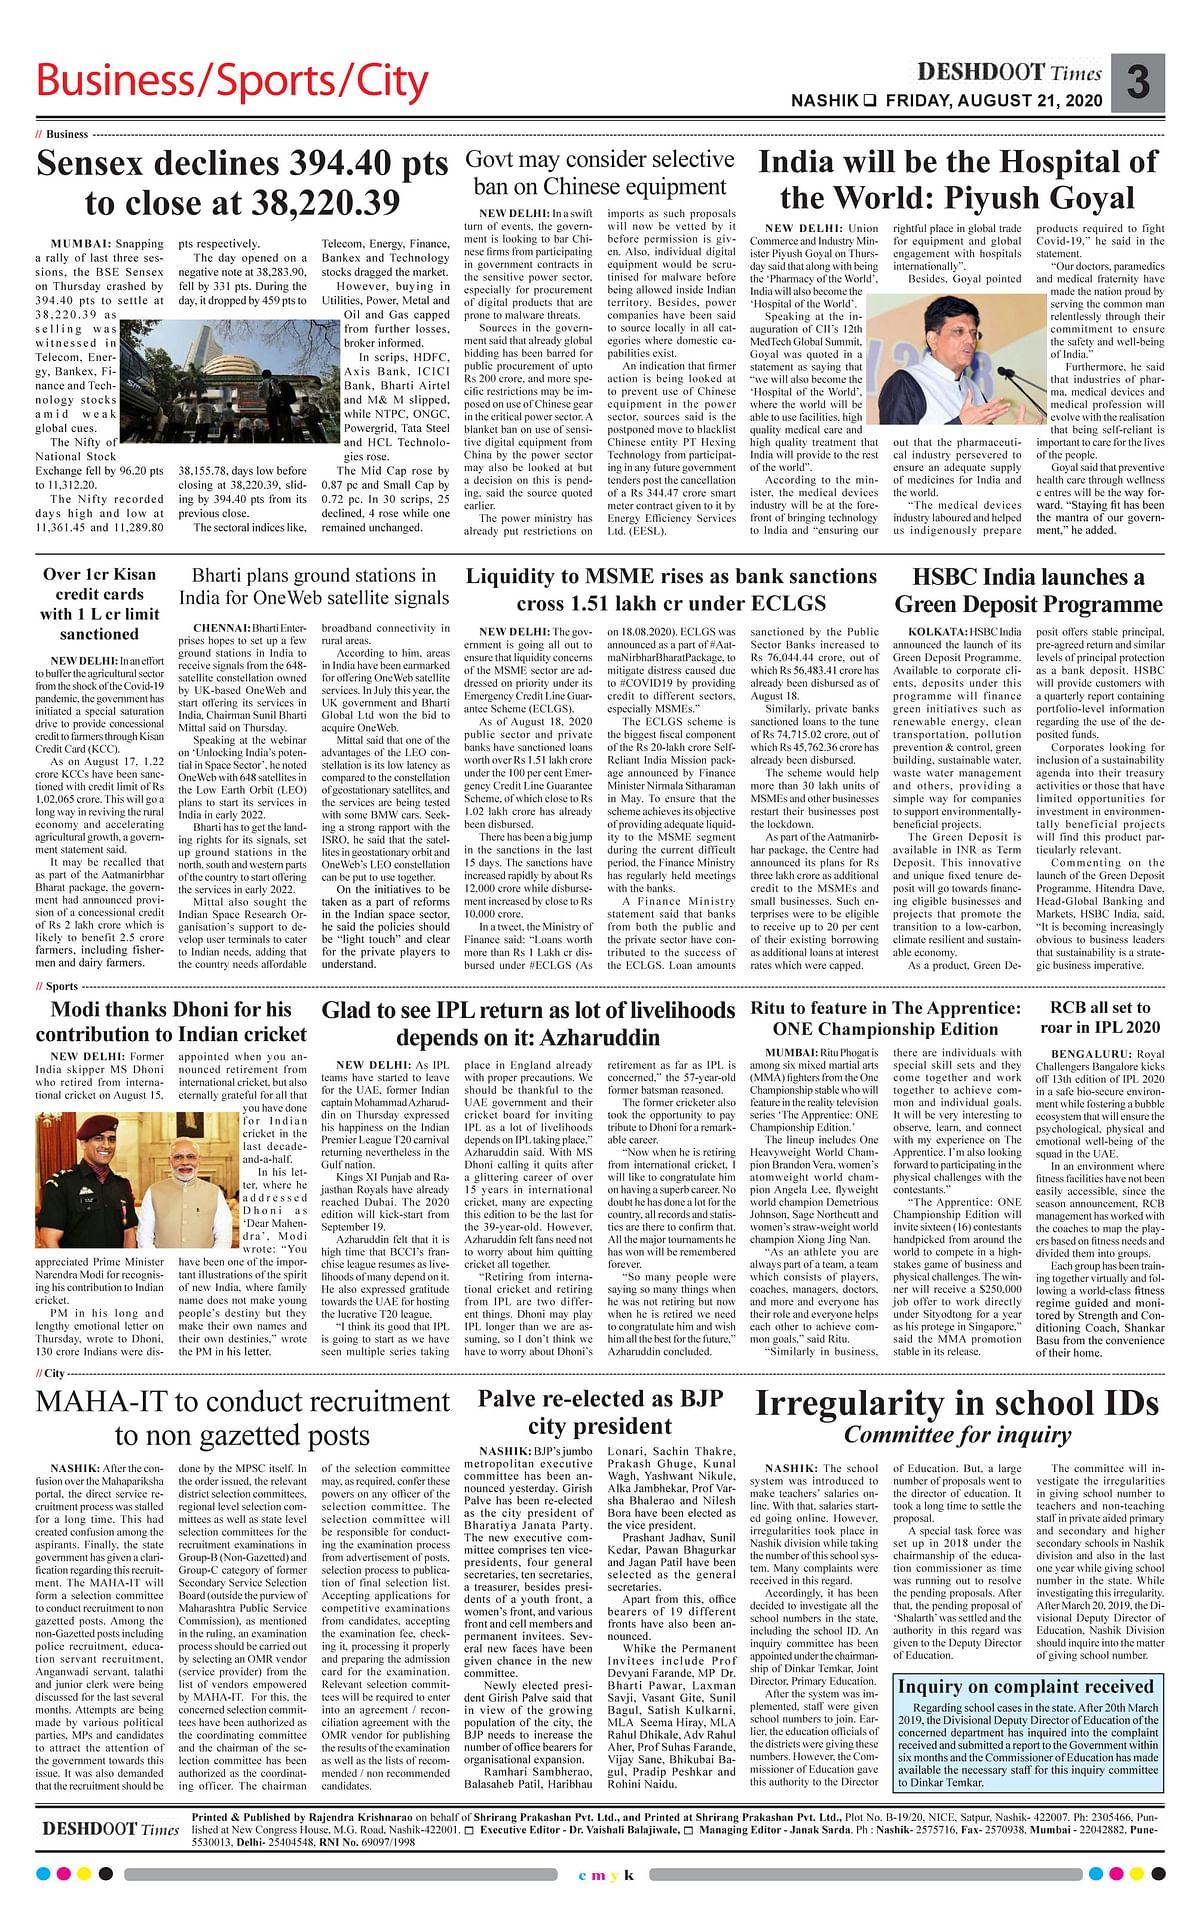 Deshdoot Times E Paper, 21 August 2020